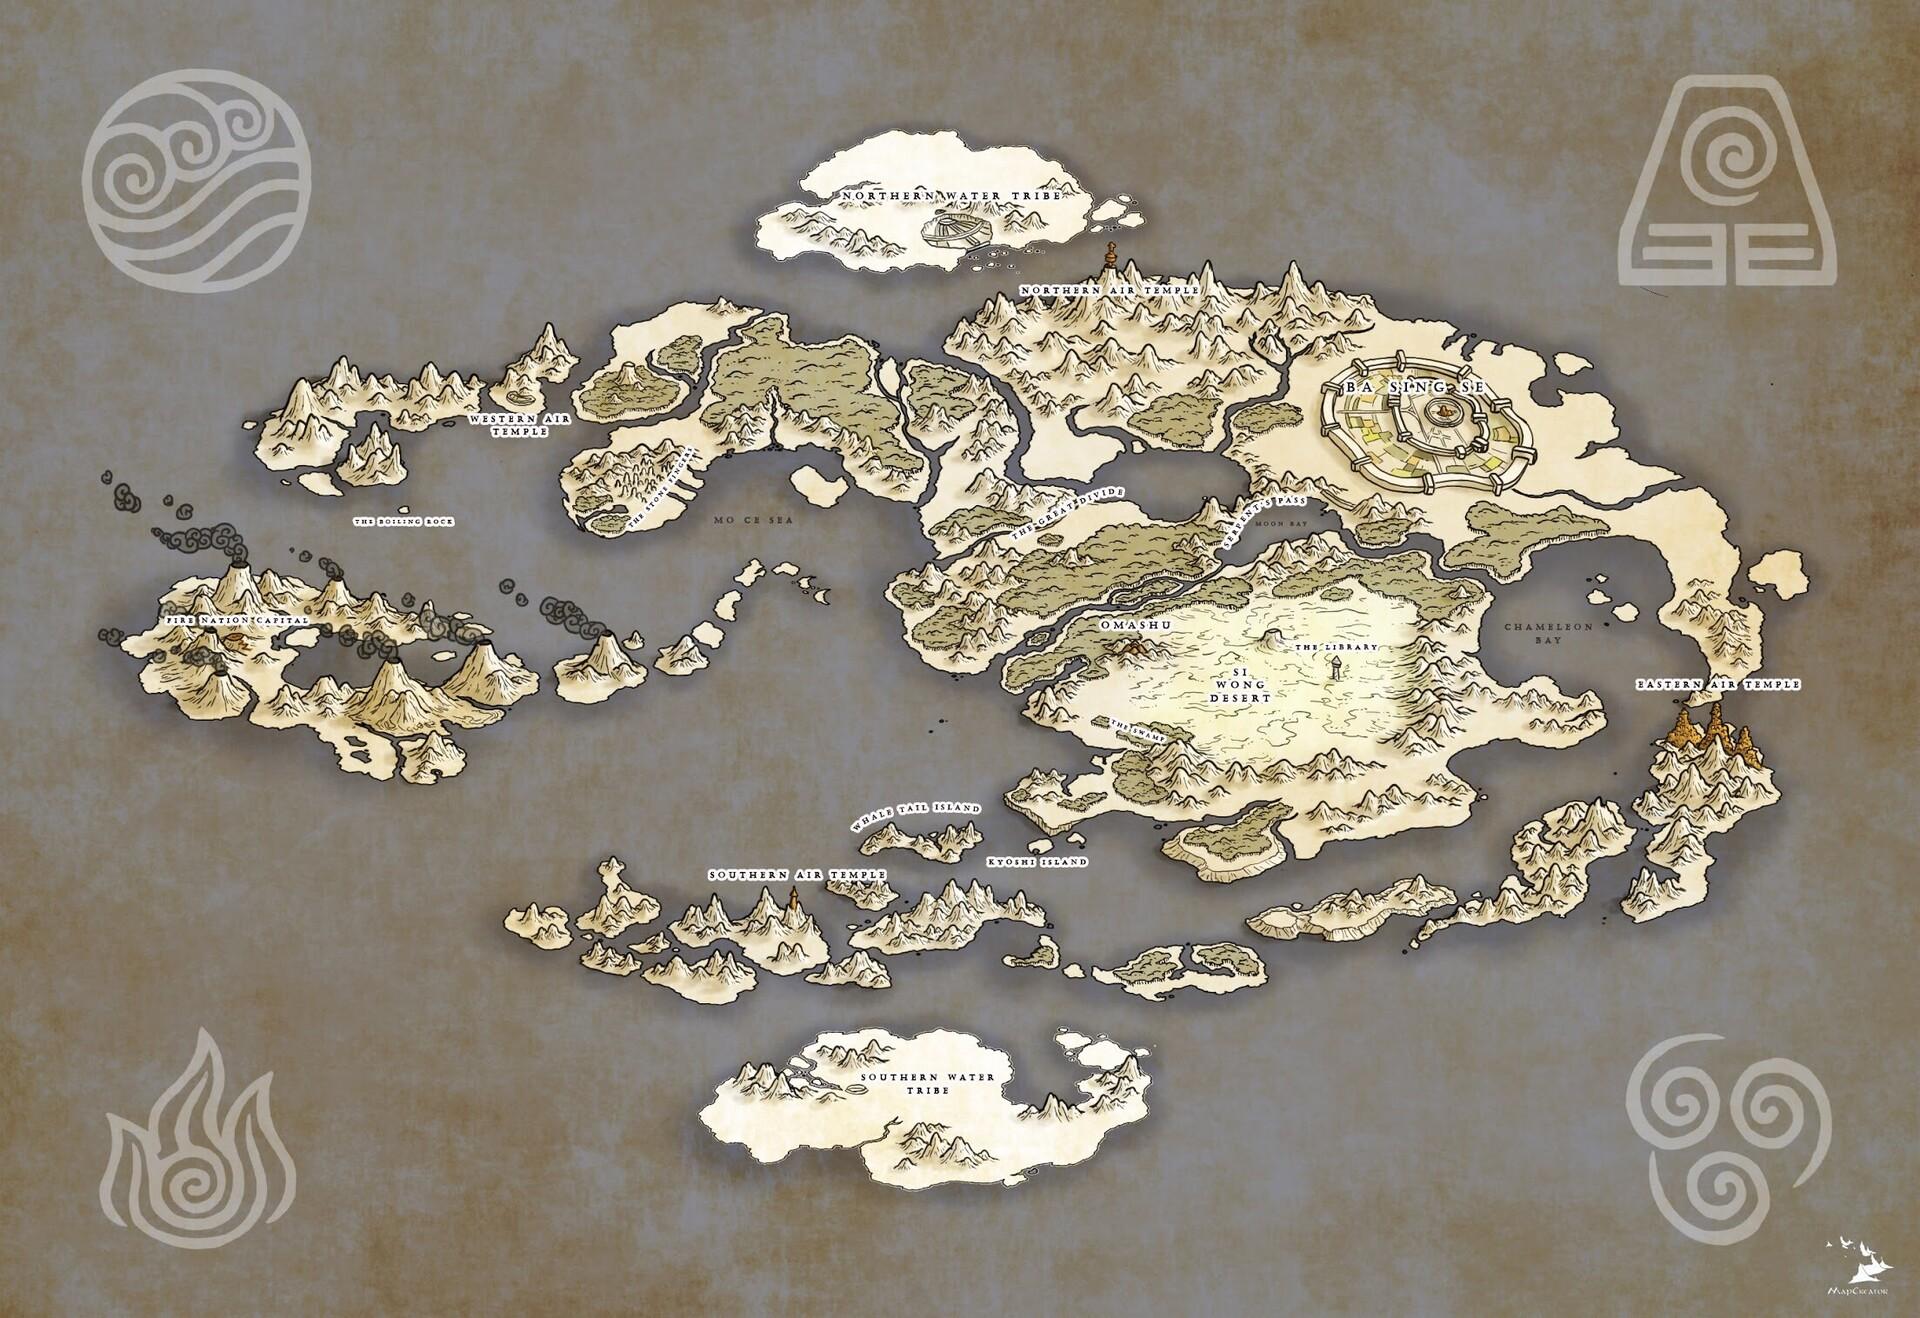 James Nalepa - Avatar the Last Airbender World Map